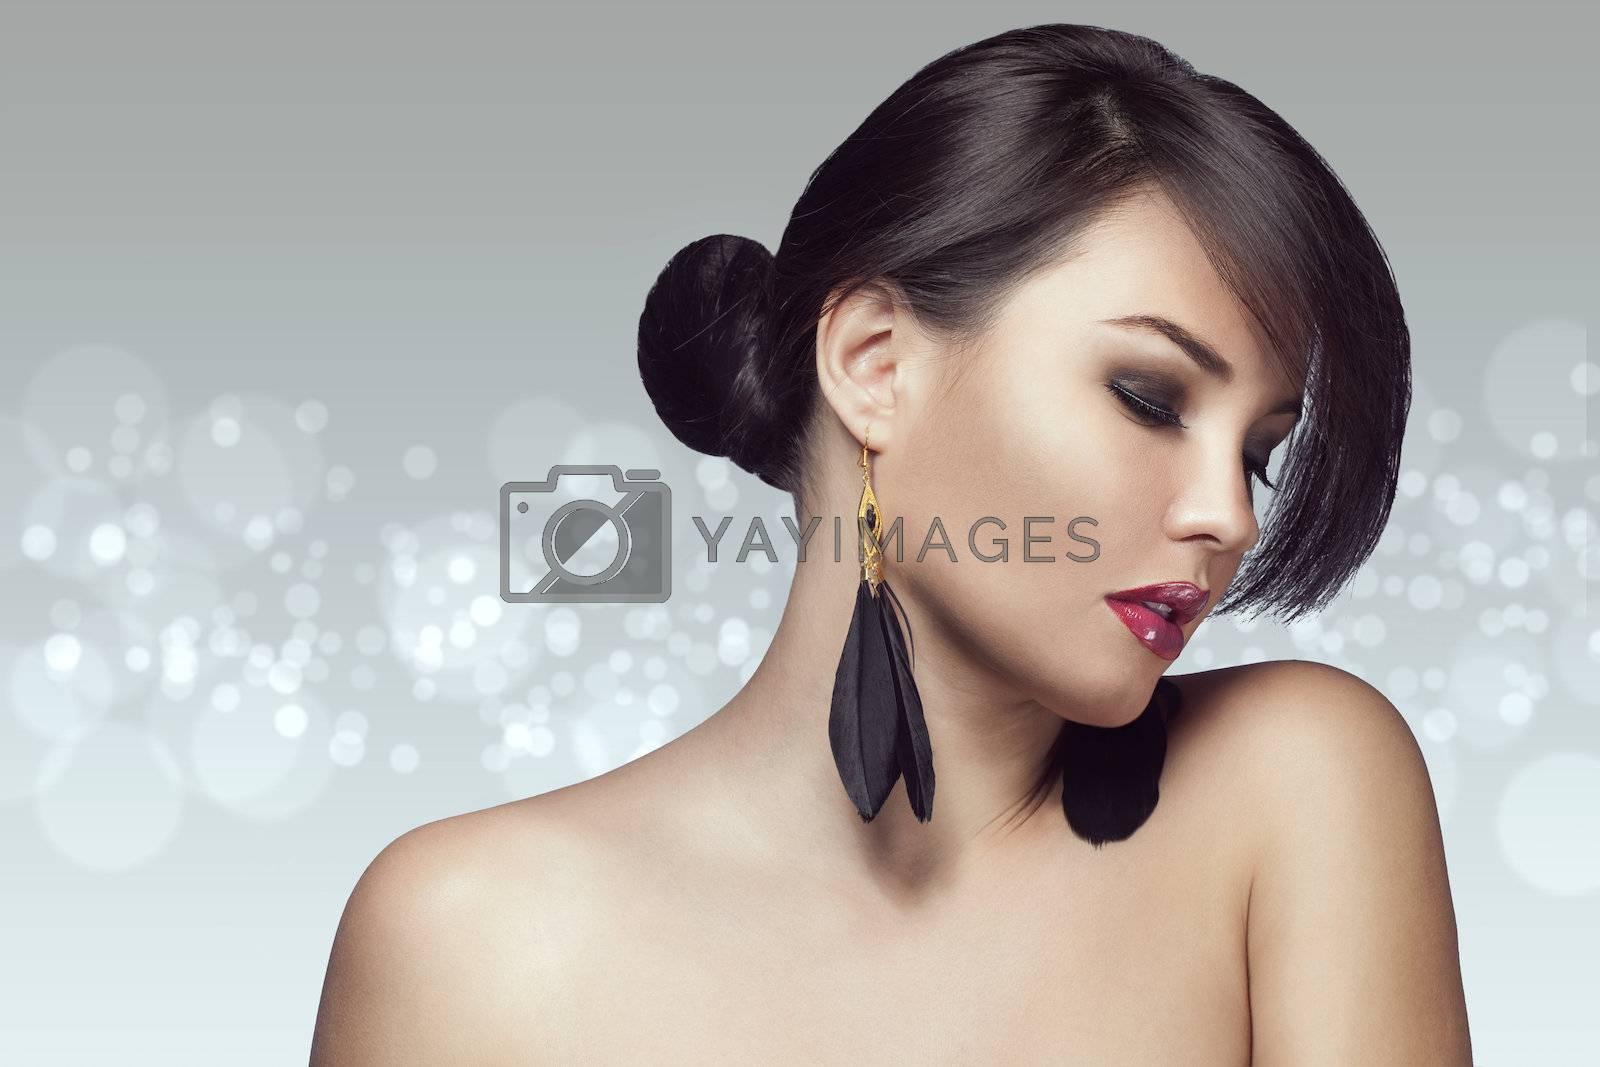 Beauty by alenkasm